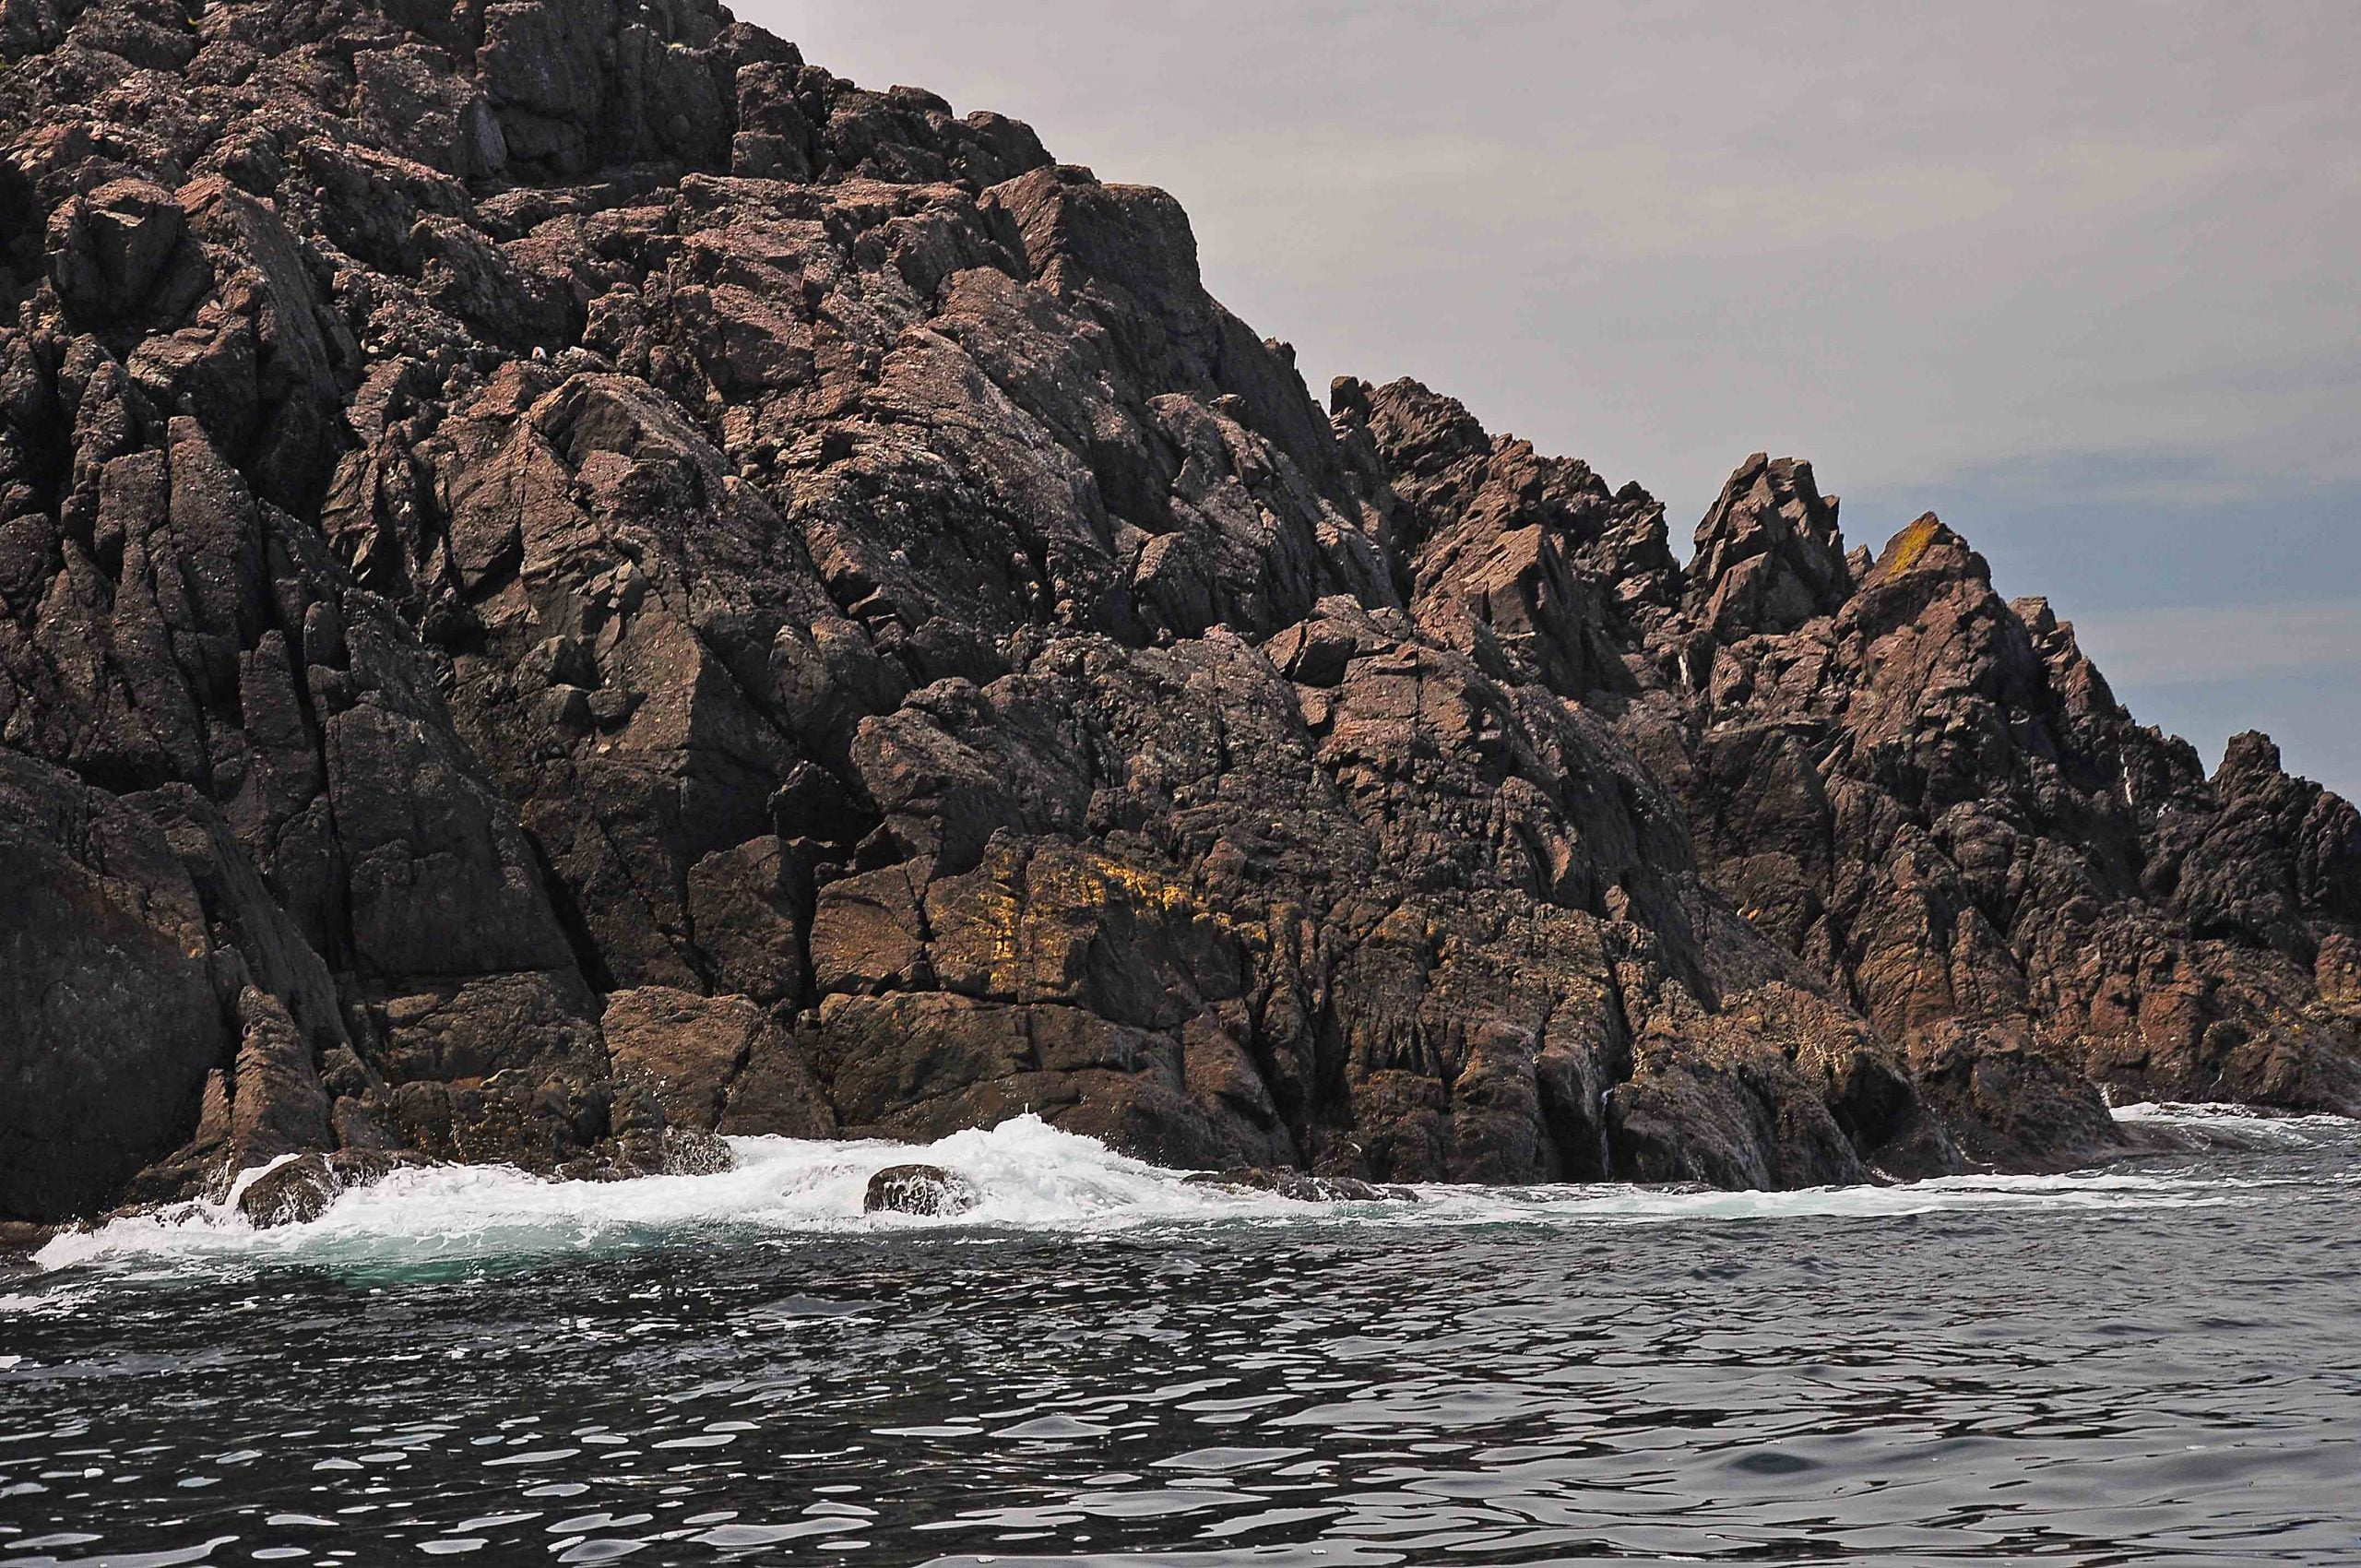 From Nova Scotia to Newfoundland by Motorhome